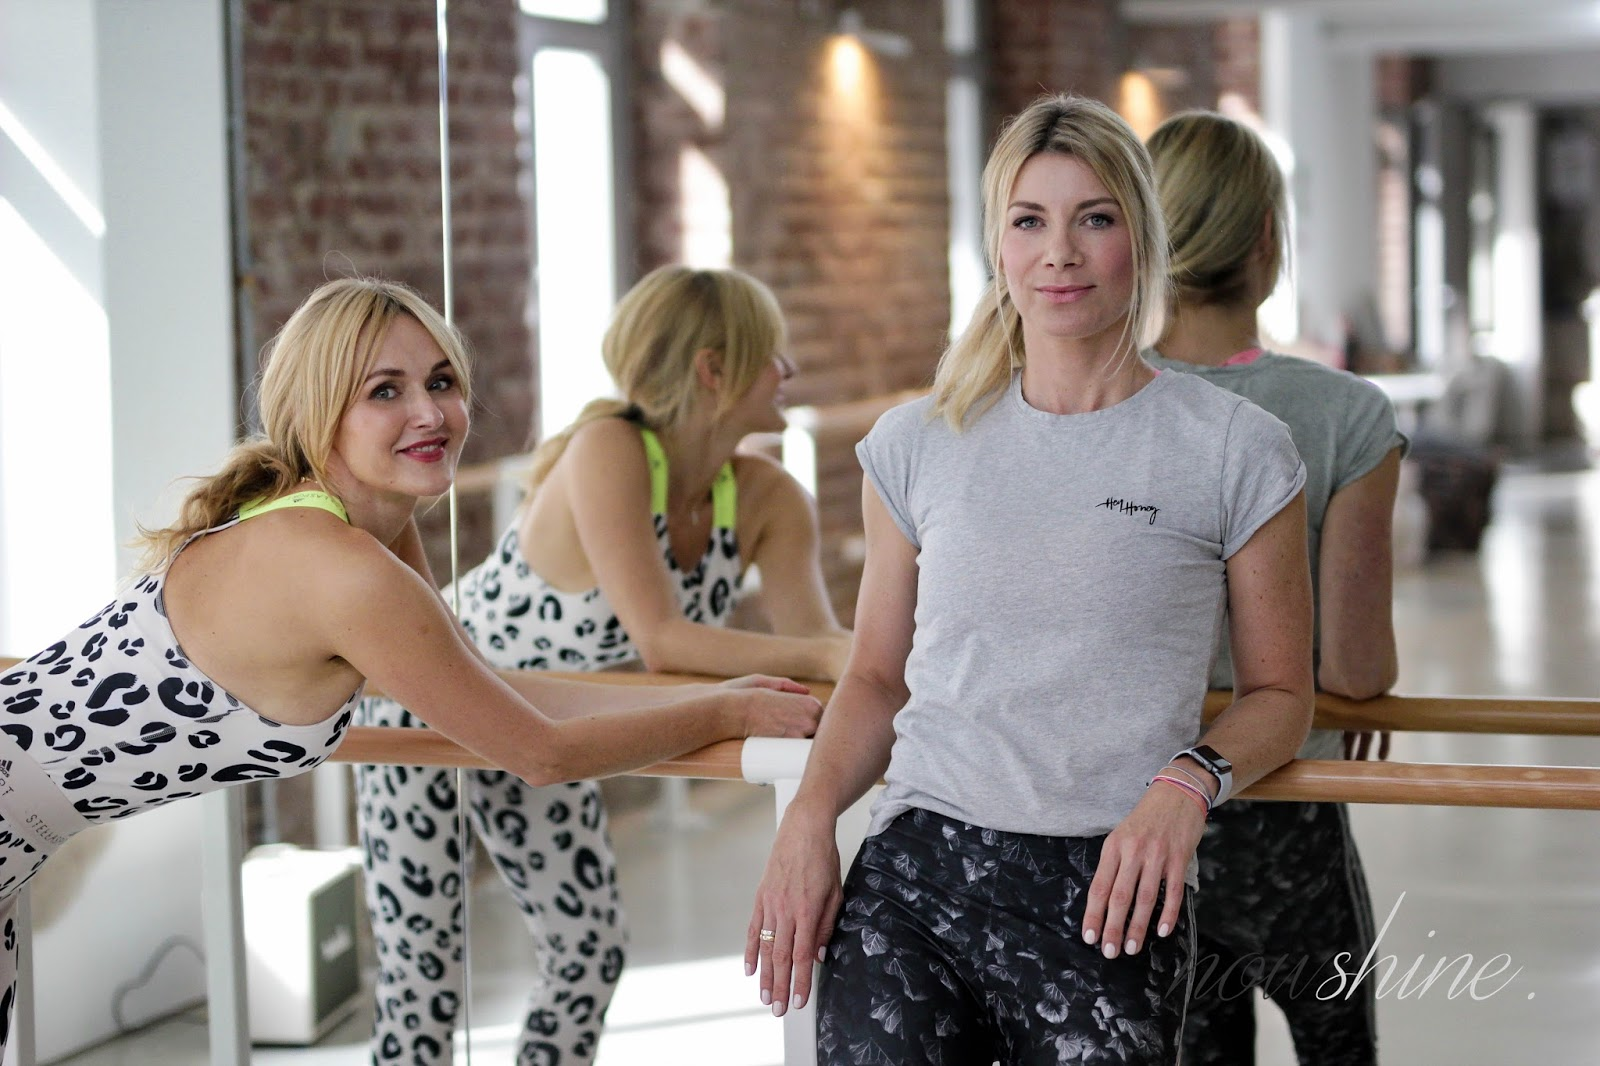 Cornelia Dingendorf und Nowshine bei Youpila in Düsseldorf - Nowshine Fitness über 40